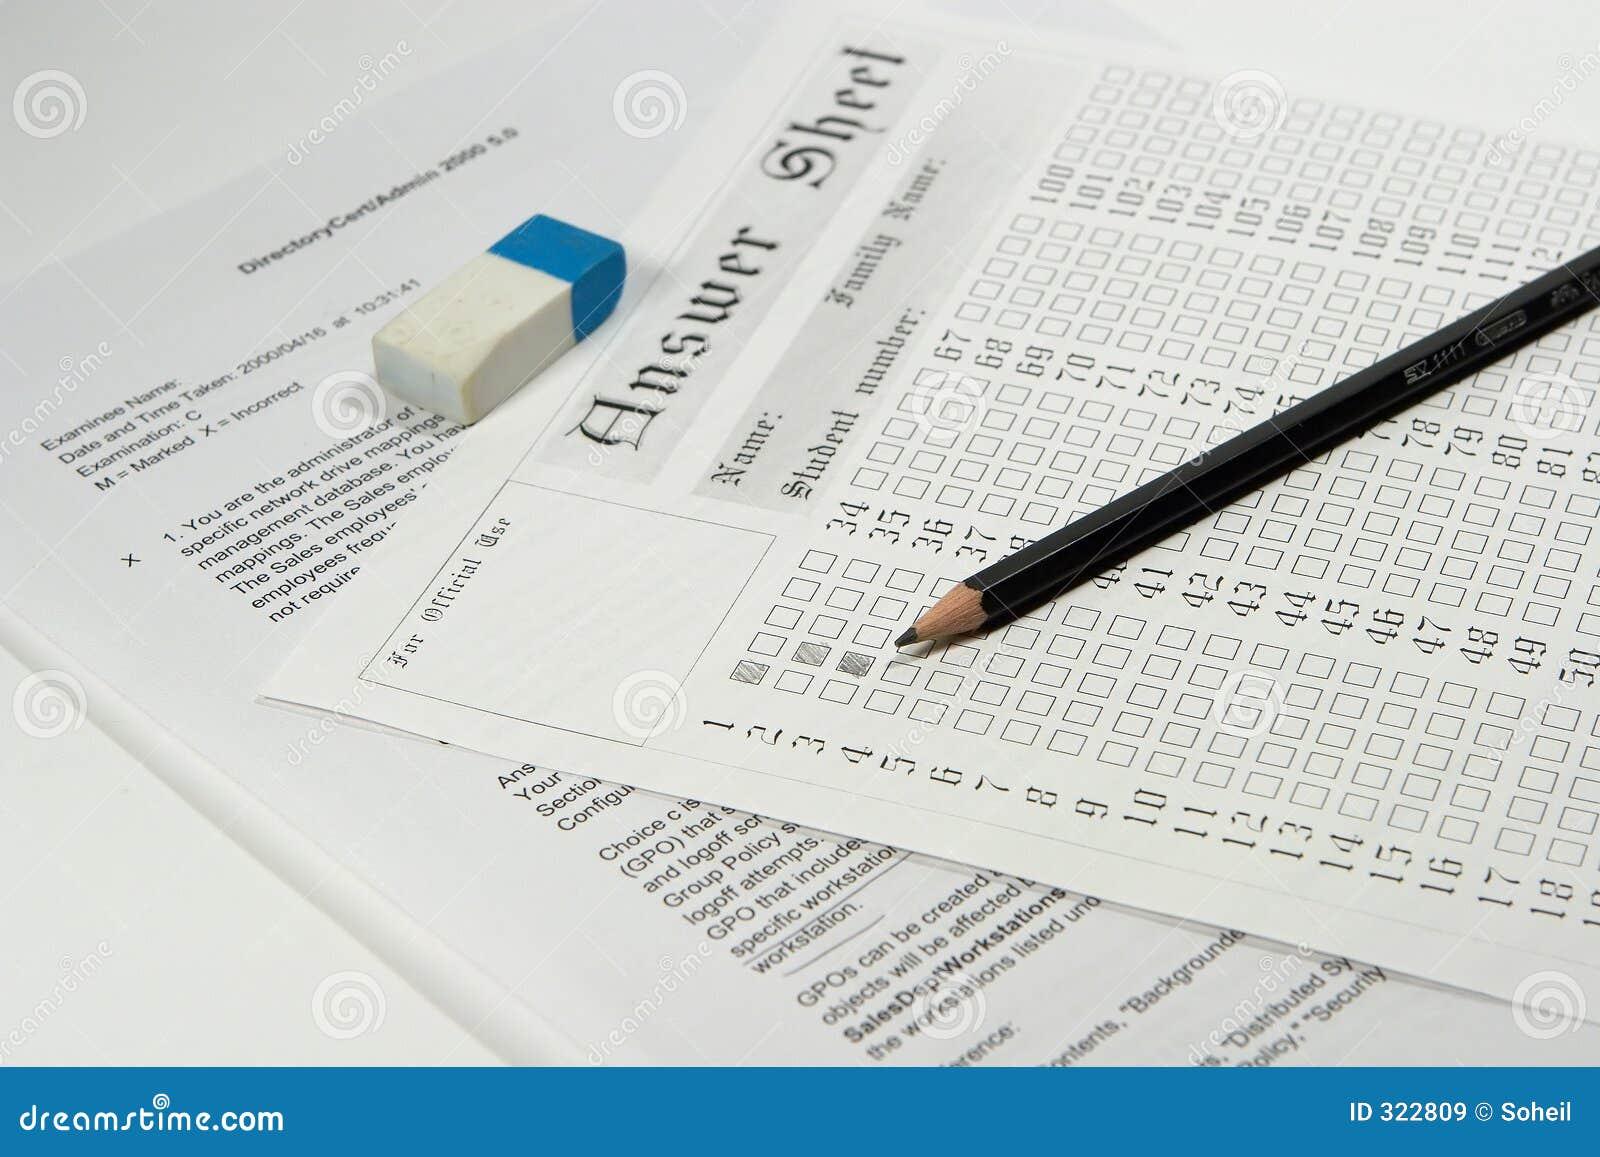 term exams paper